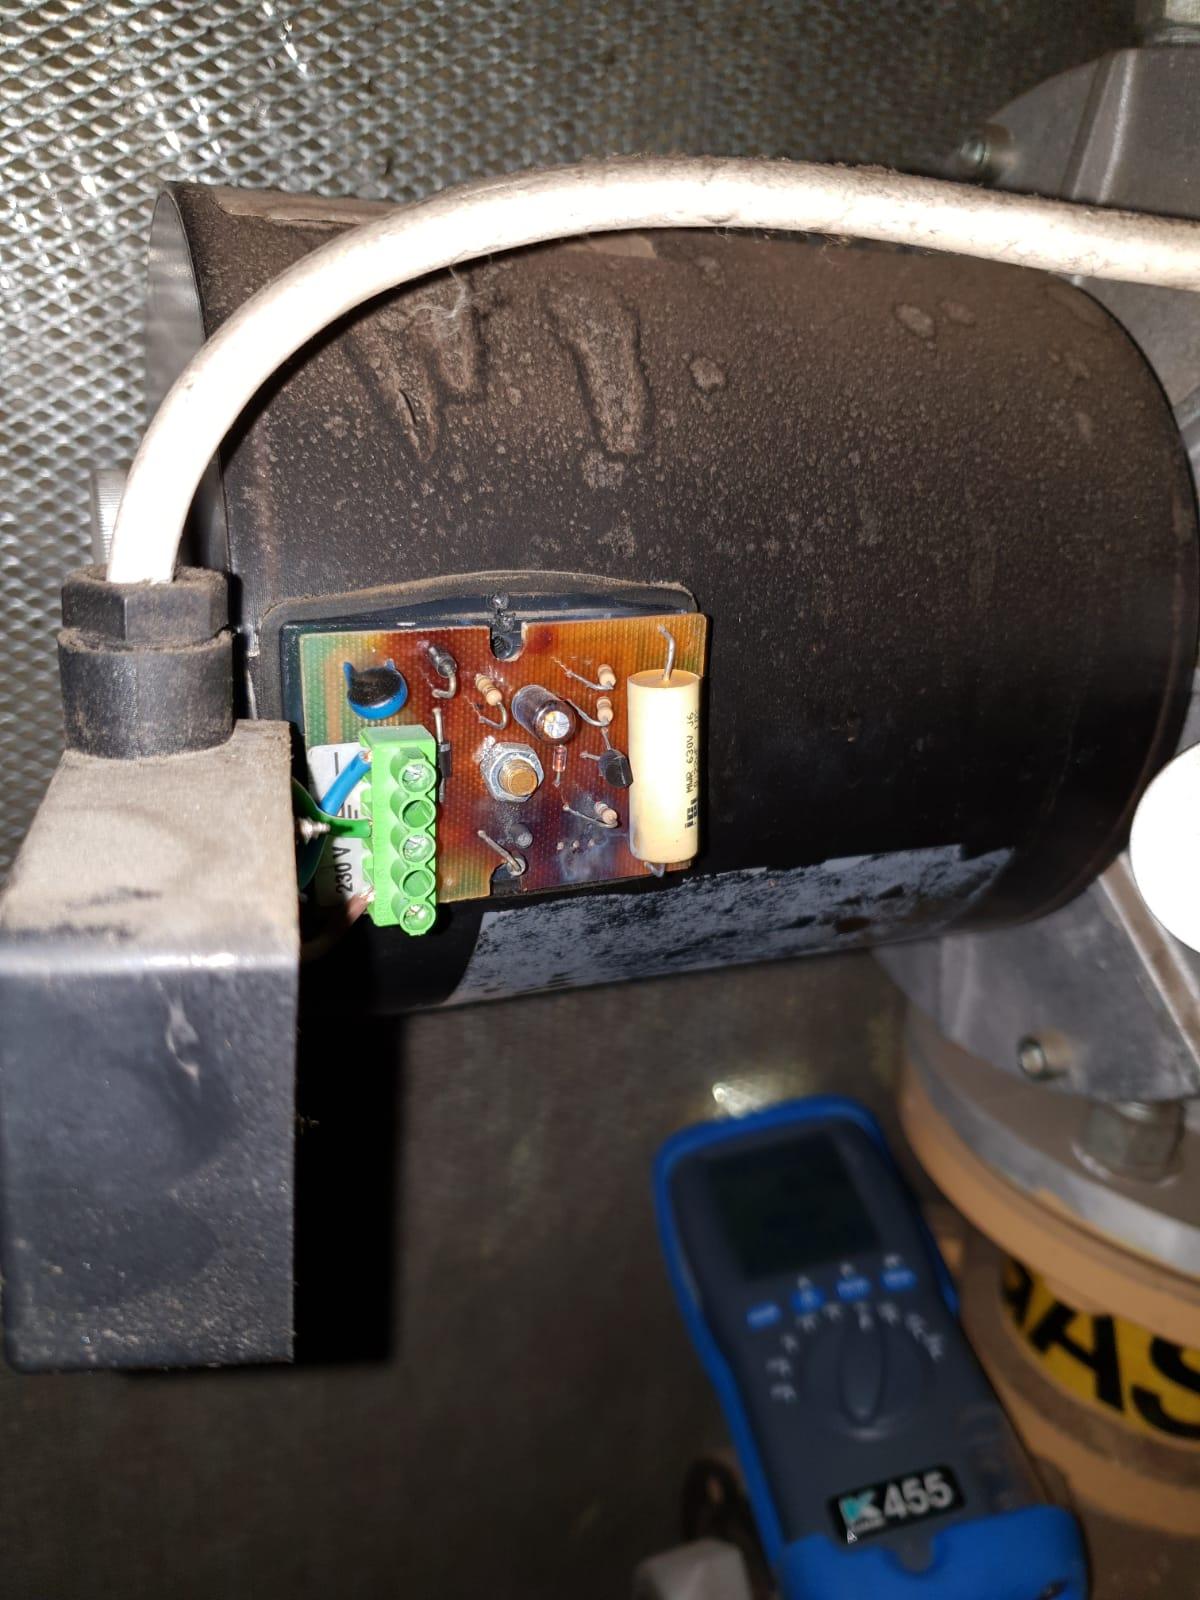 Commercial size gas solenoid valve's controls burnt